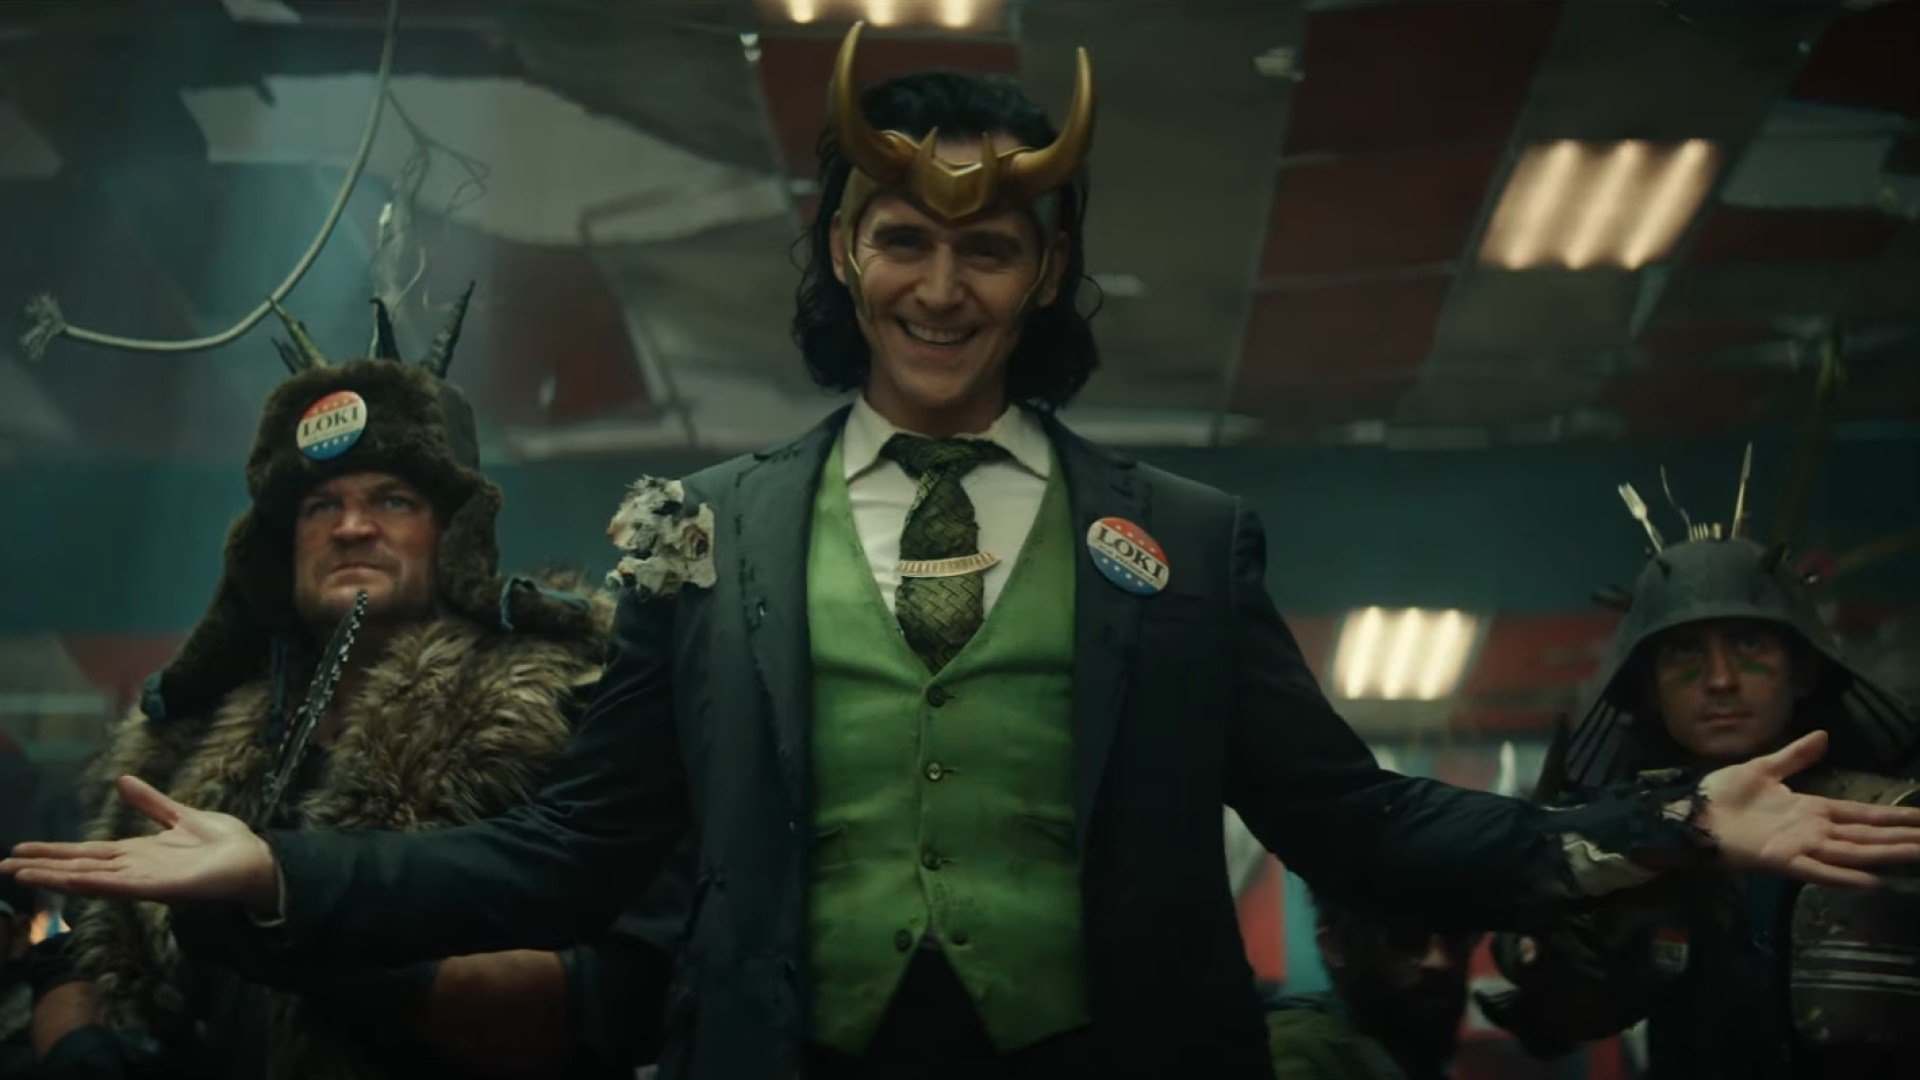 Streaming, Serien, Disney+, Disney, Marvel, Marvel Cinematic Universe, Loki